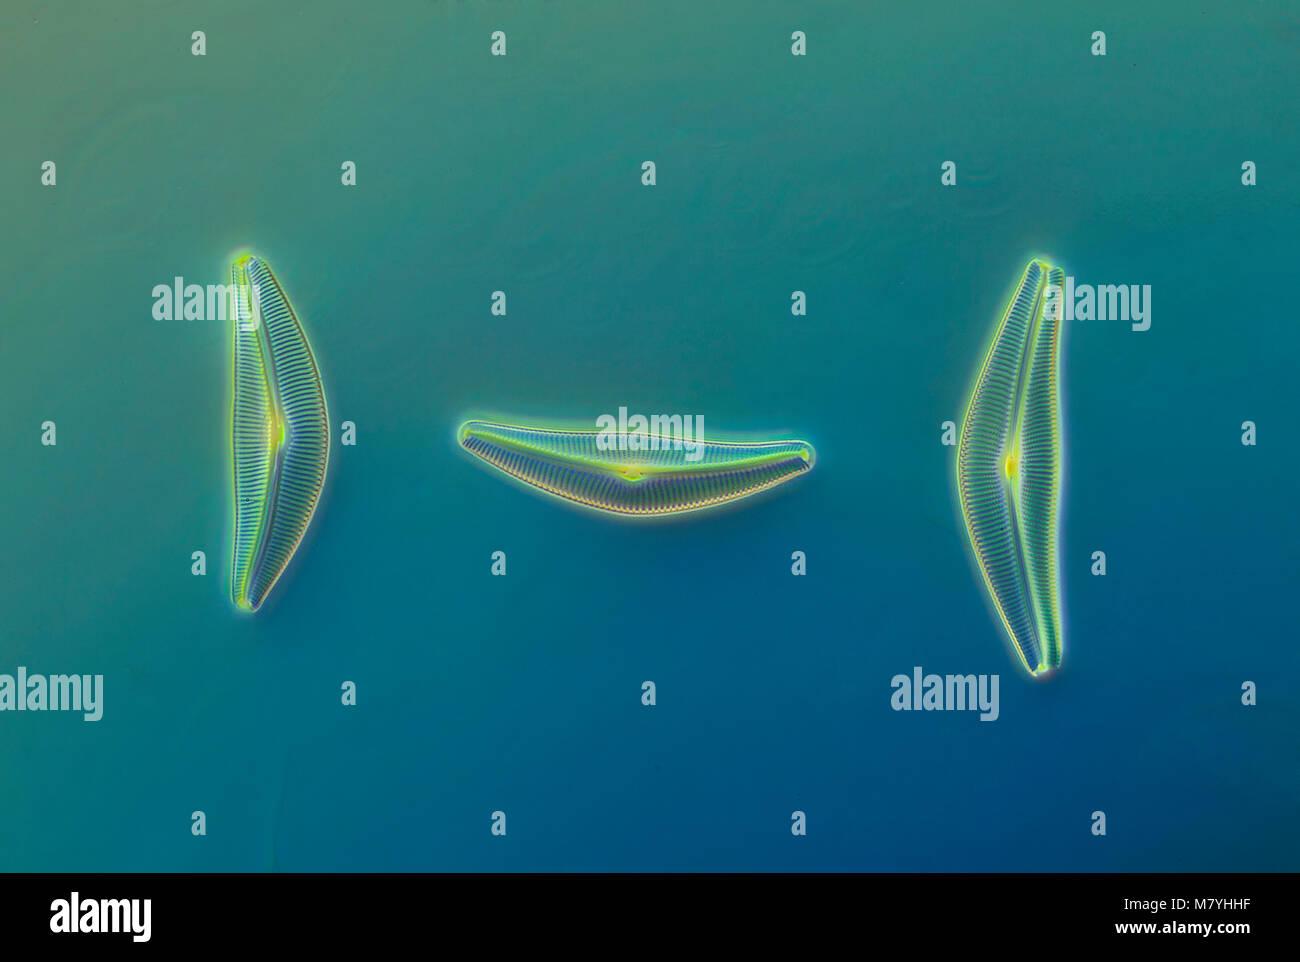 Les diatomées, Cymbella leptoceros Kg var. tumidula, darkfield photomicrographie Banque D'Images